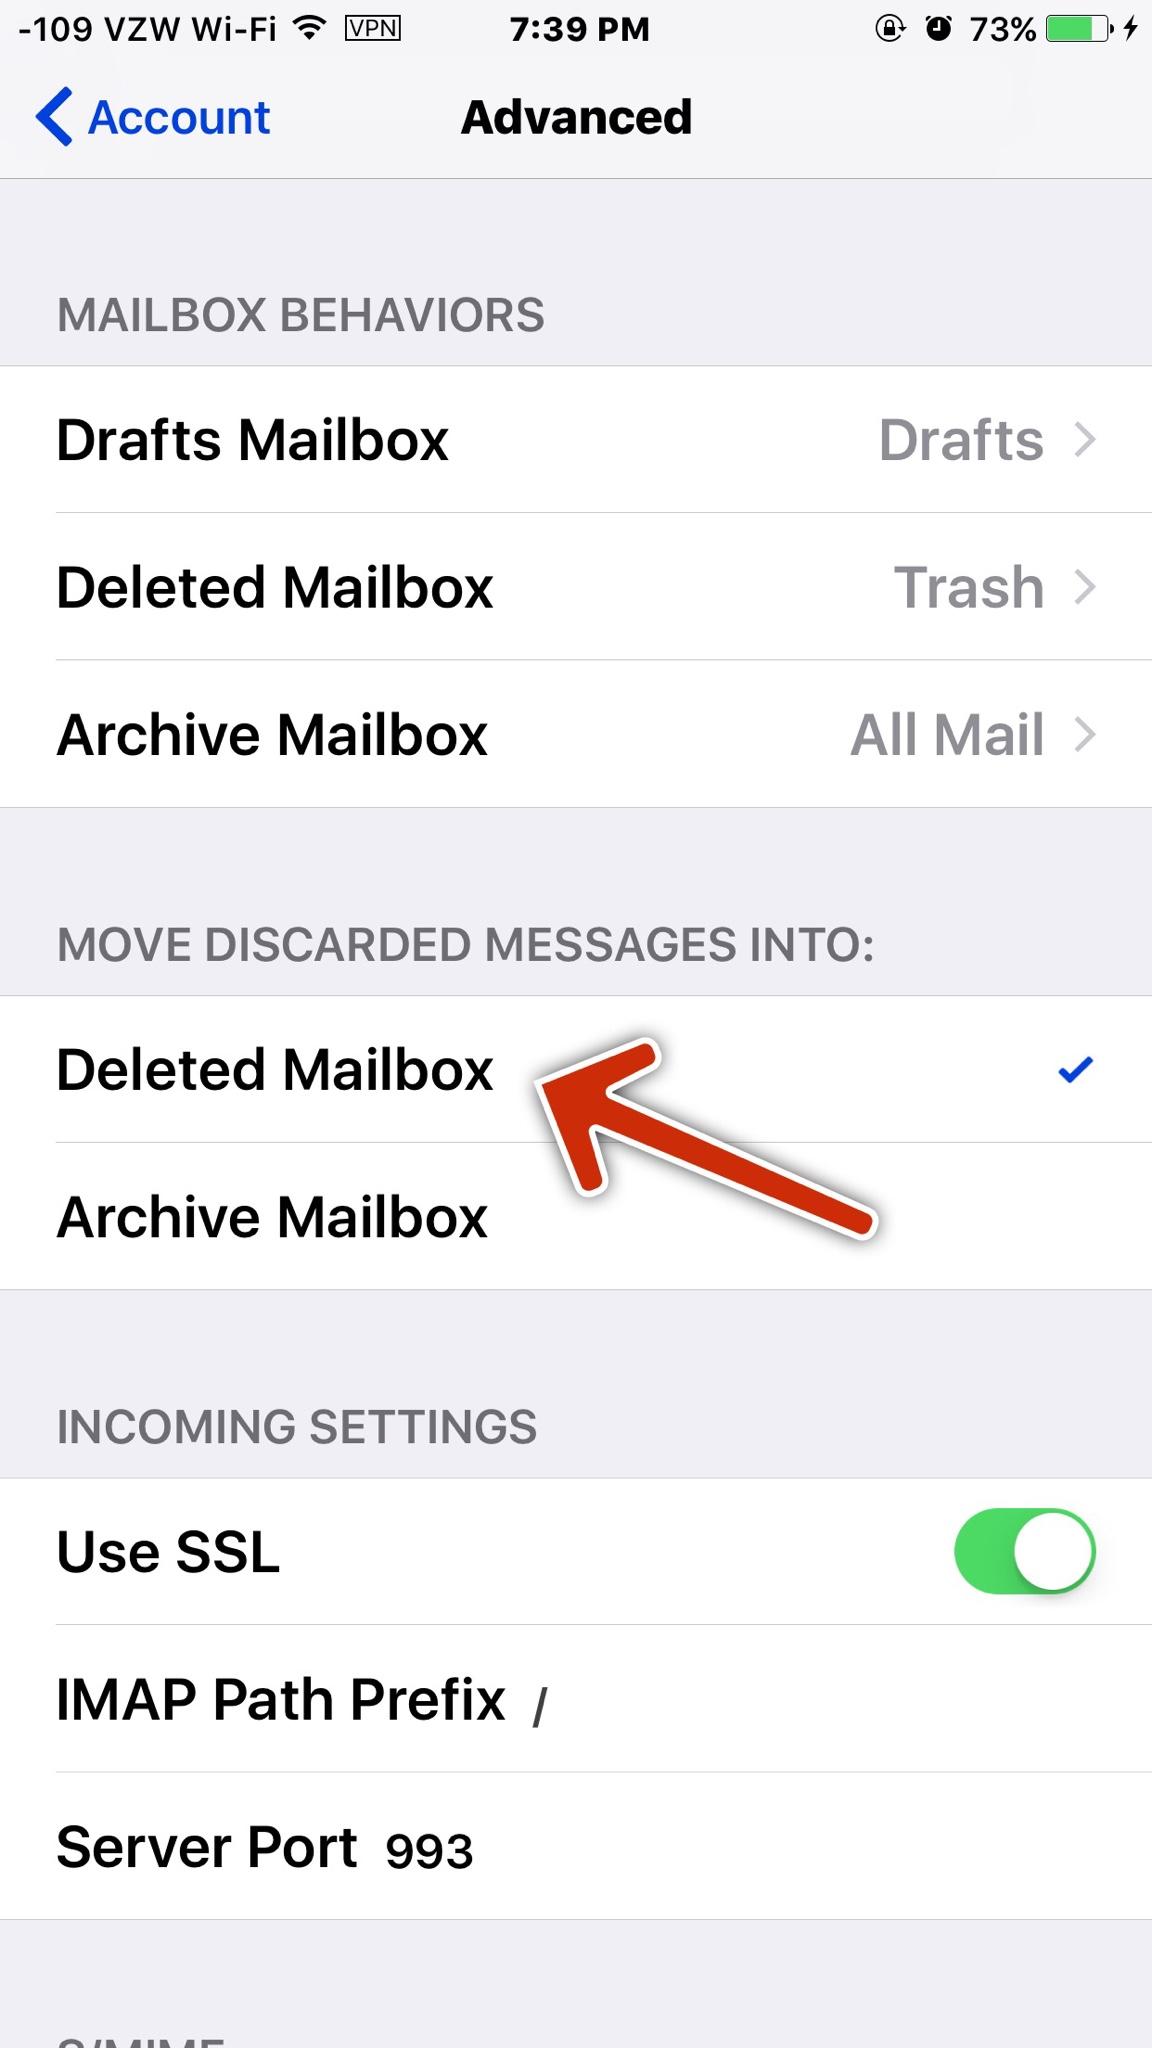 Mail loses Trash Option   sometimes  - iPhone, iPad, iPod